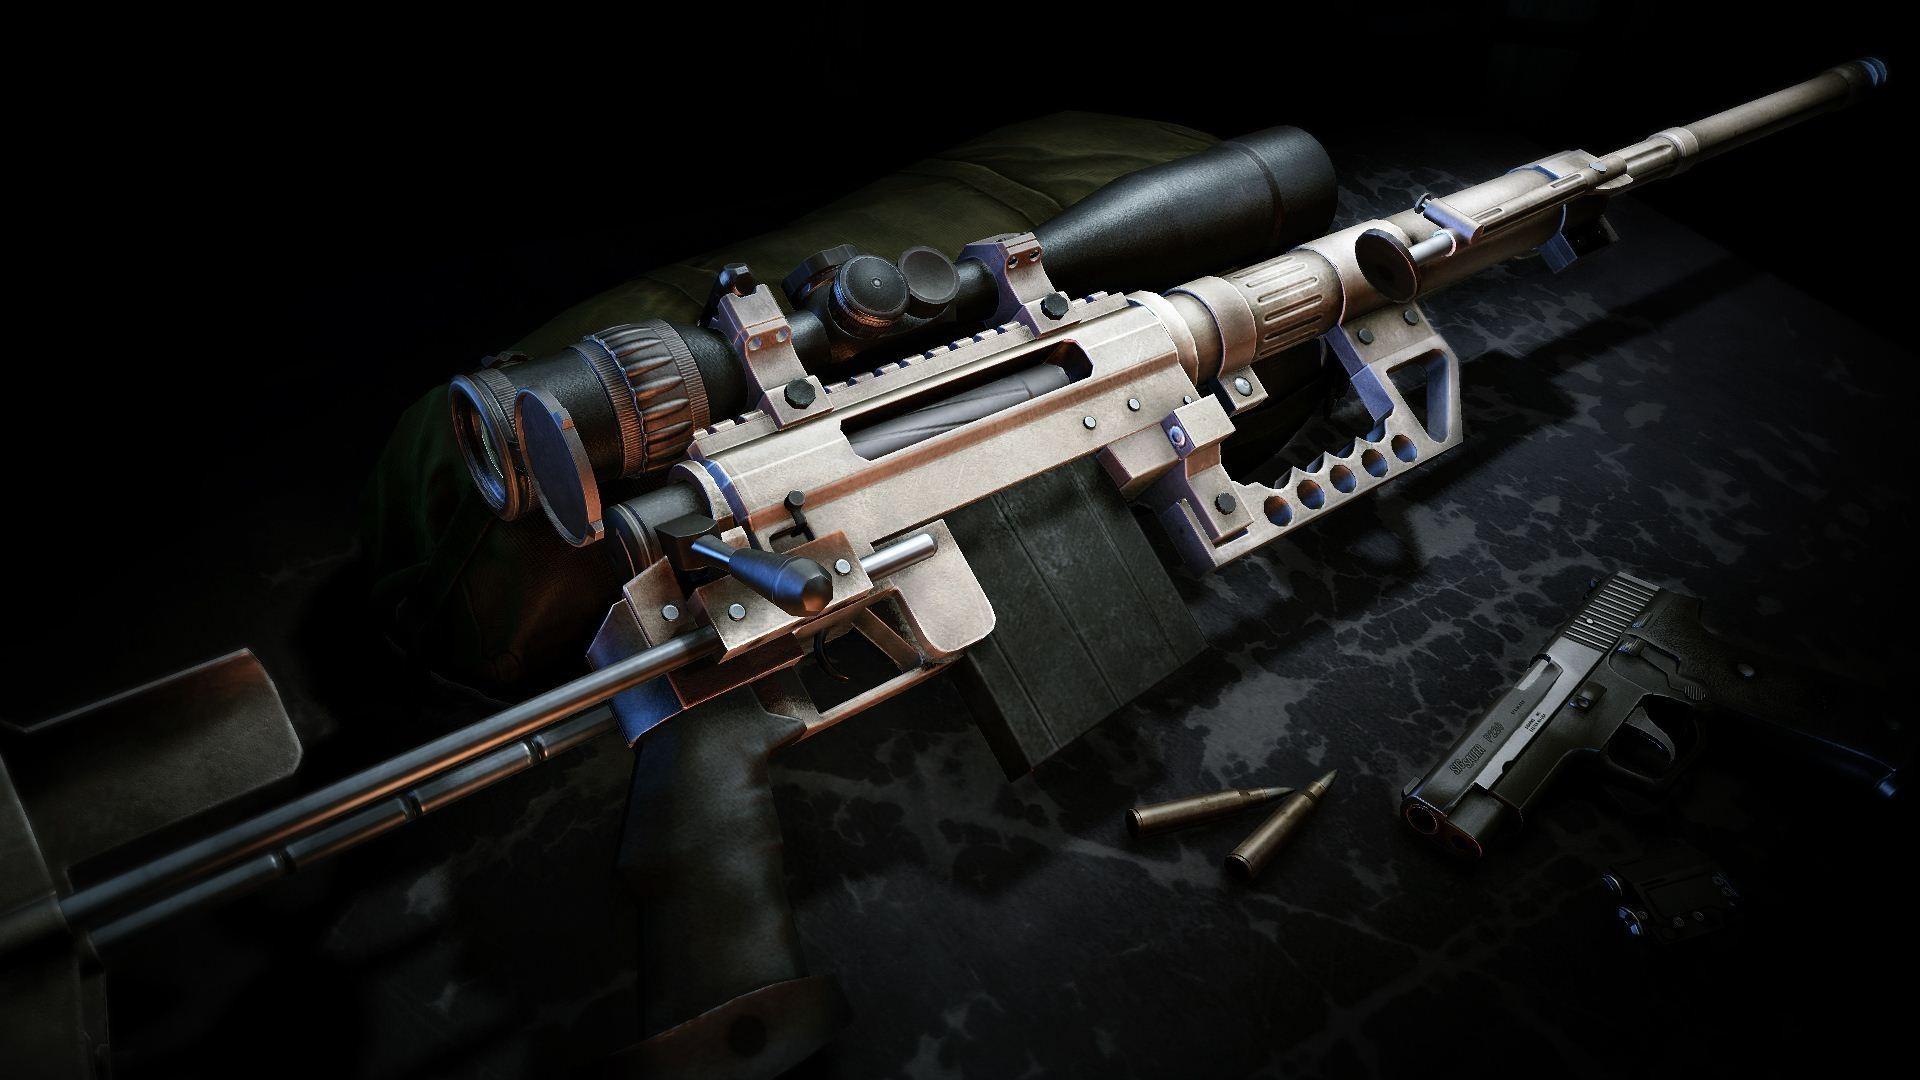 50] Sniper Rifles Wallpaper on WallpaperSafari 1920x1080